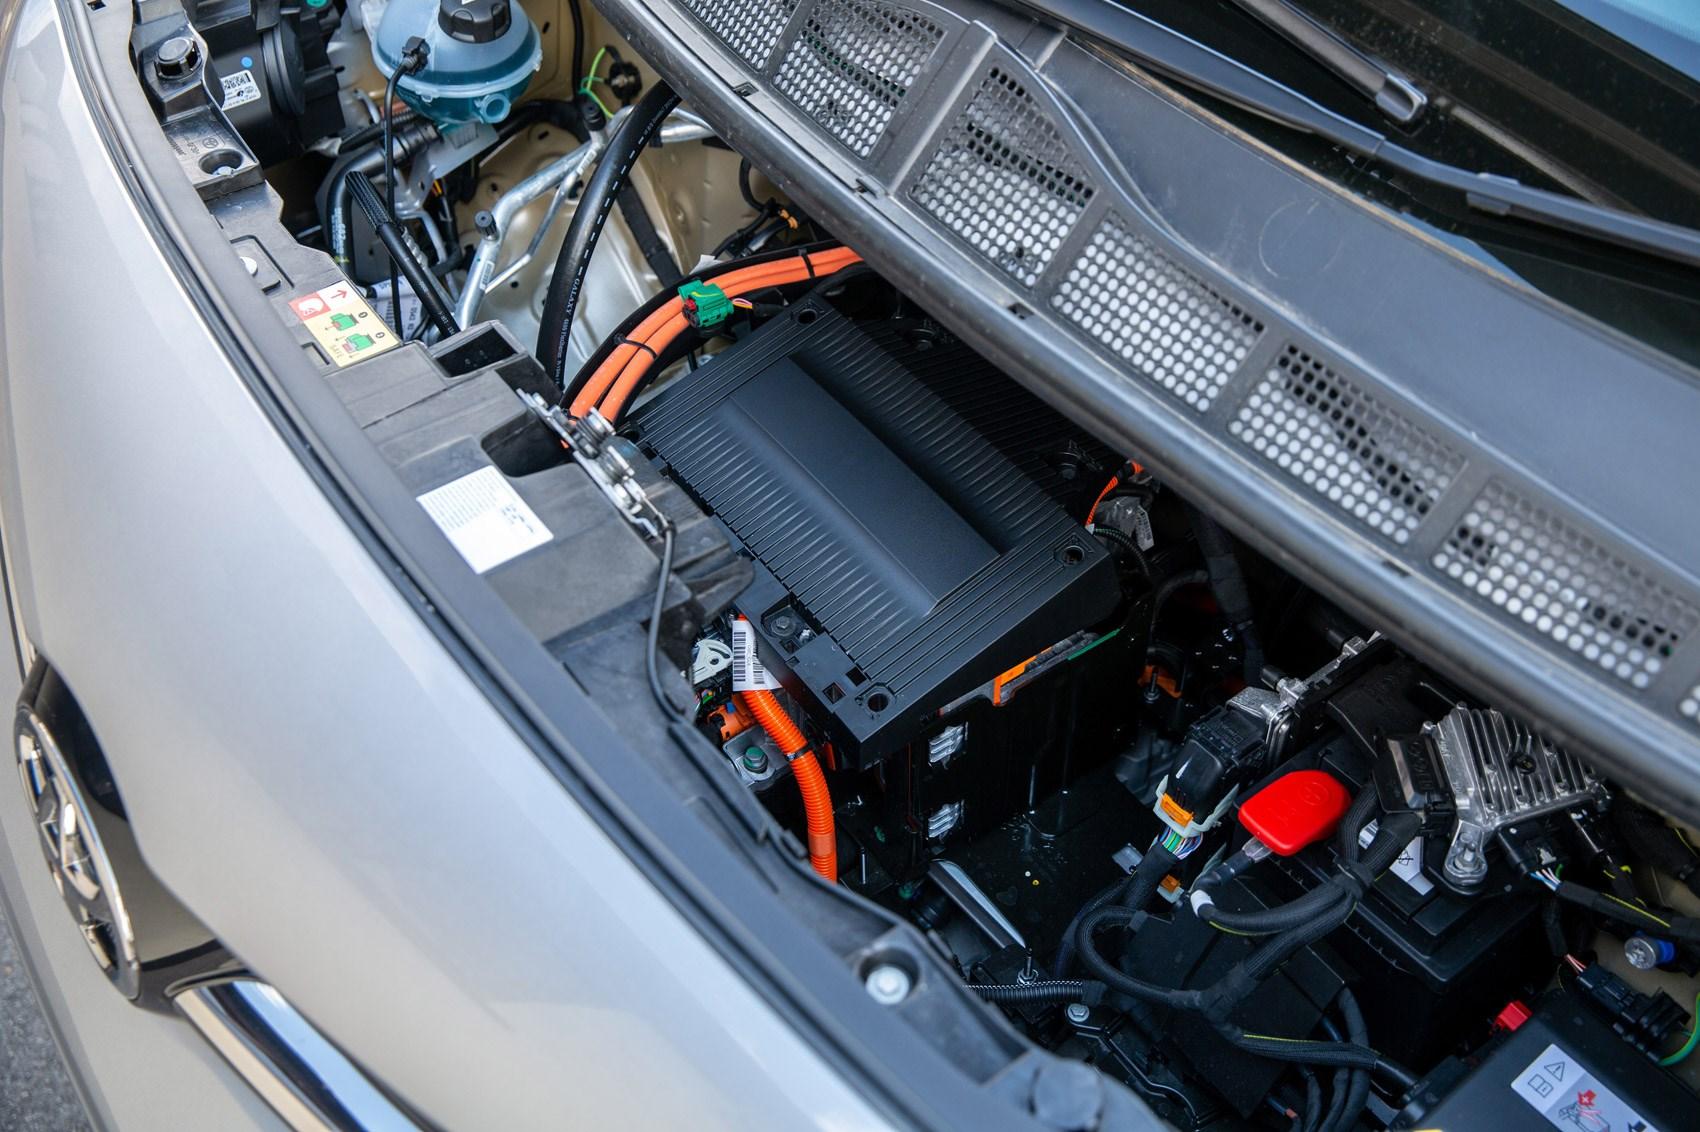 Toyota Proace Electric van review, reliability, view under bonnet